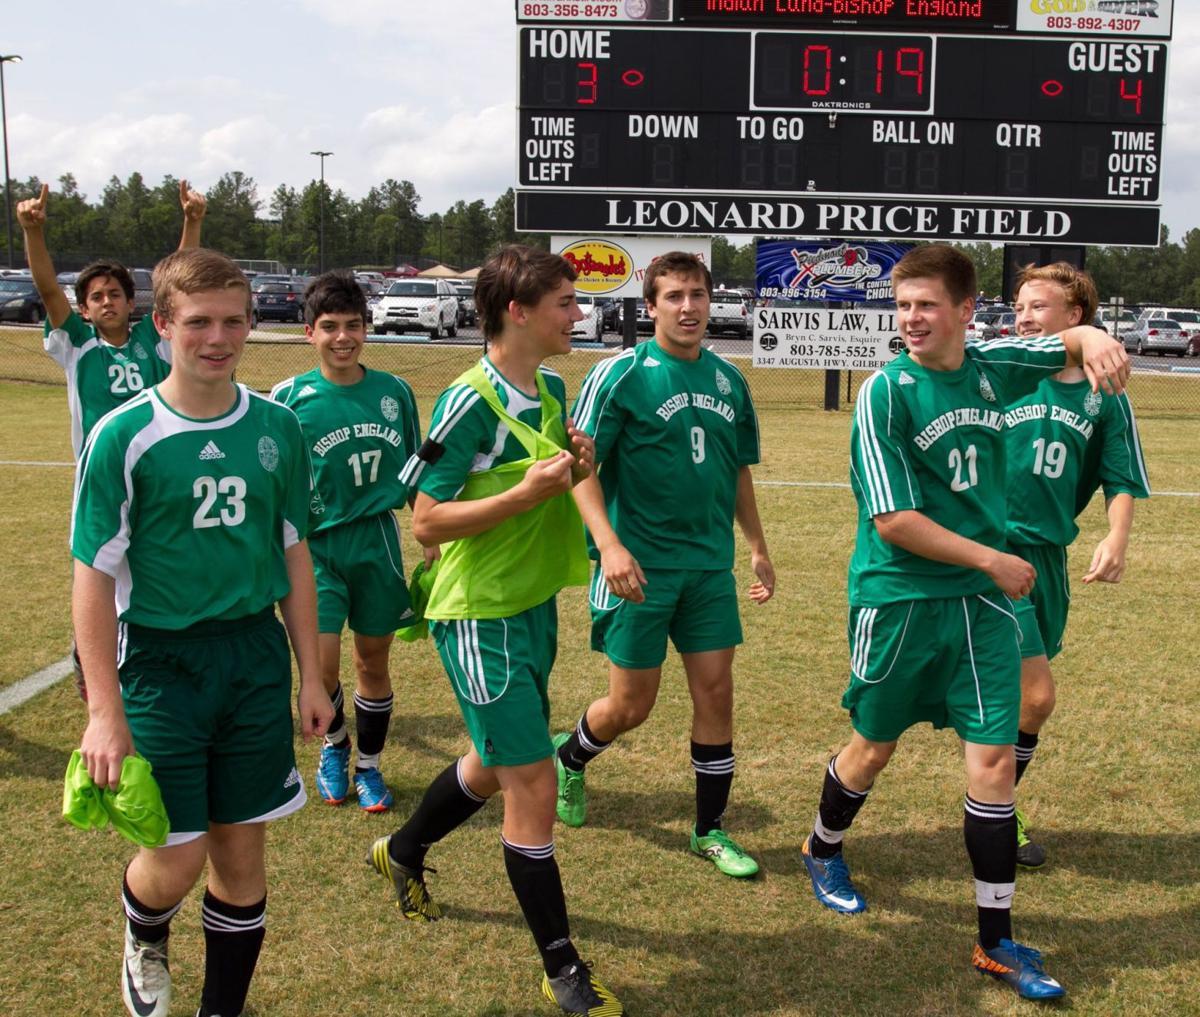 Bishop England wins 16th boys soccer state championship